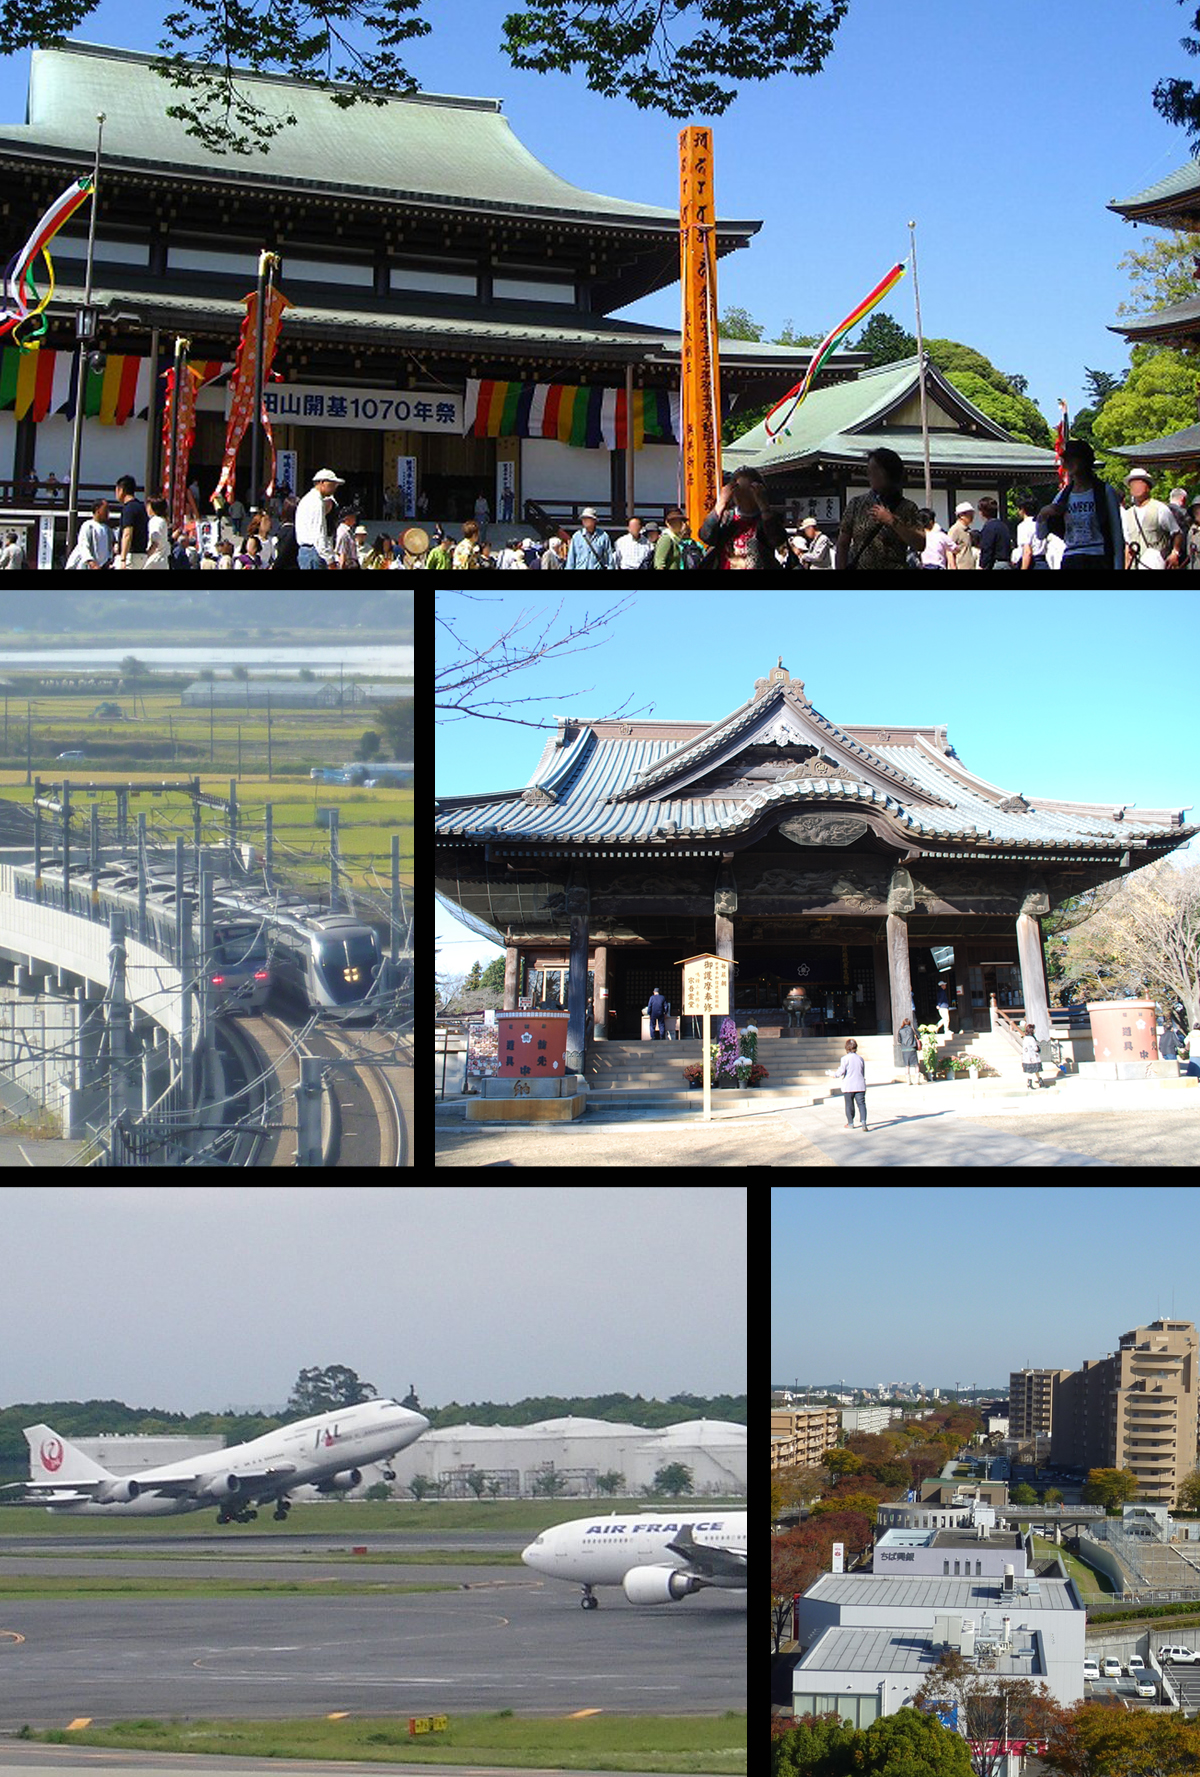 Chiba international